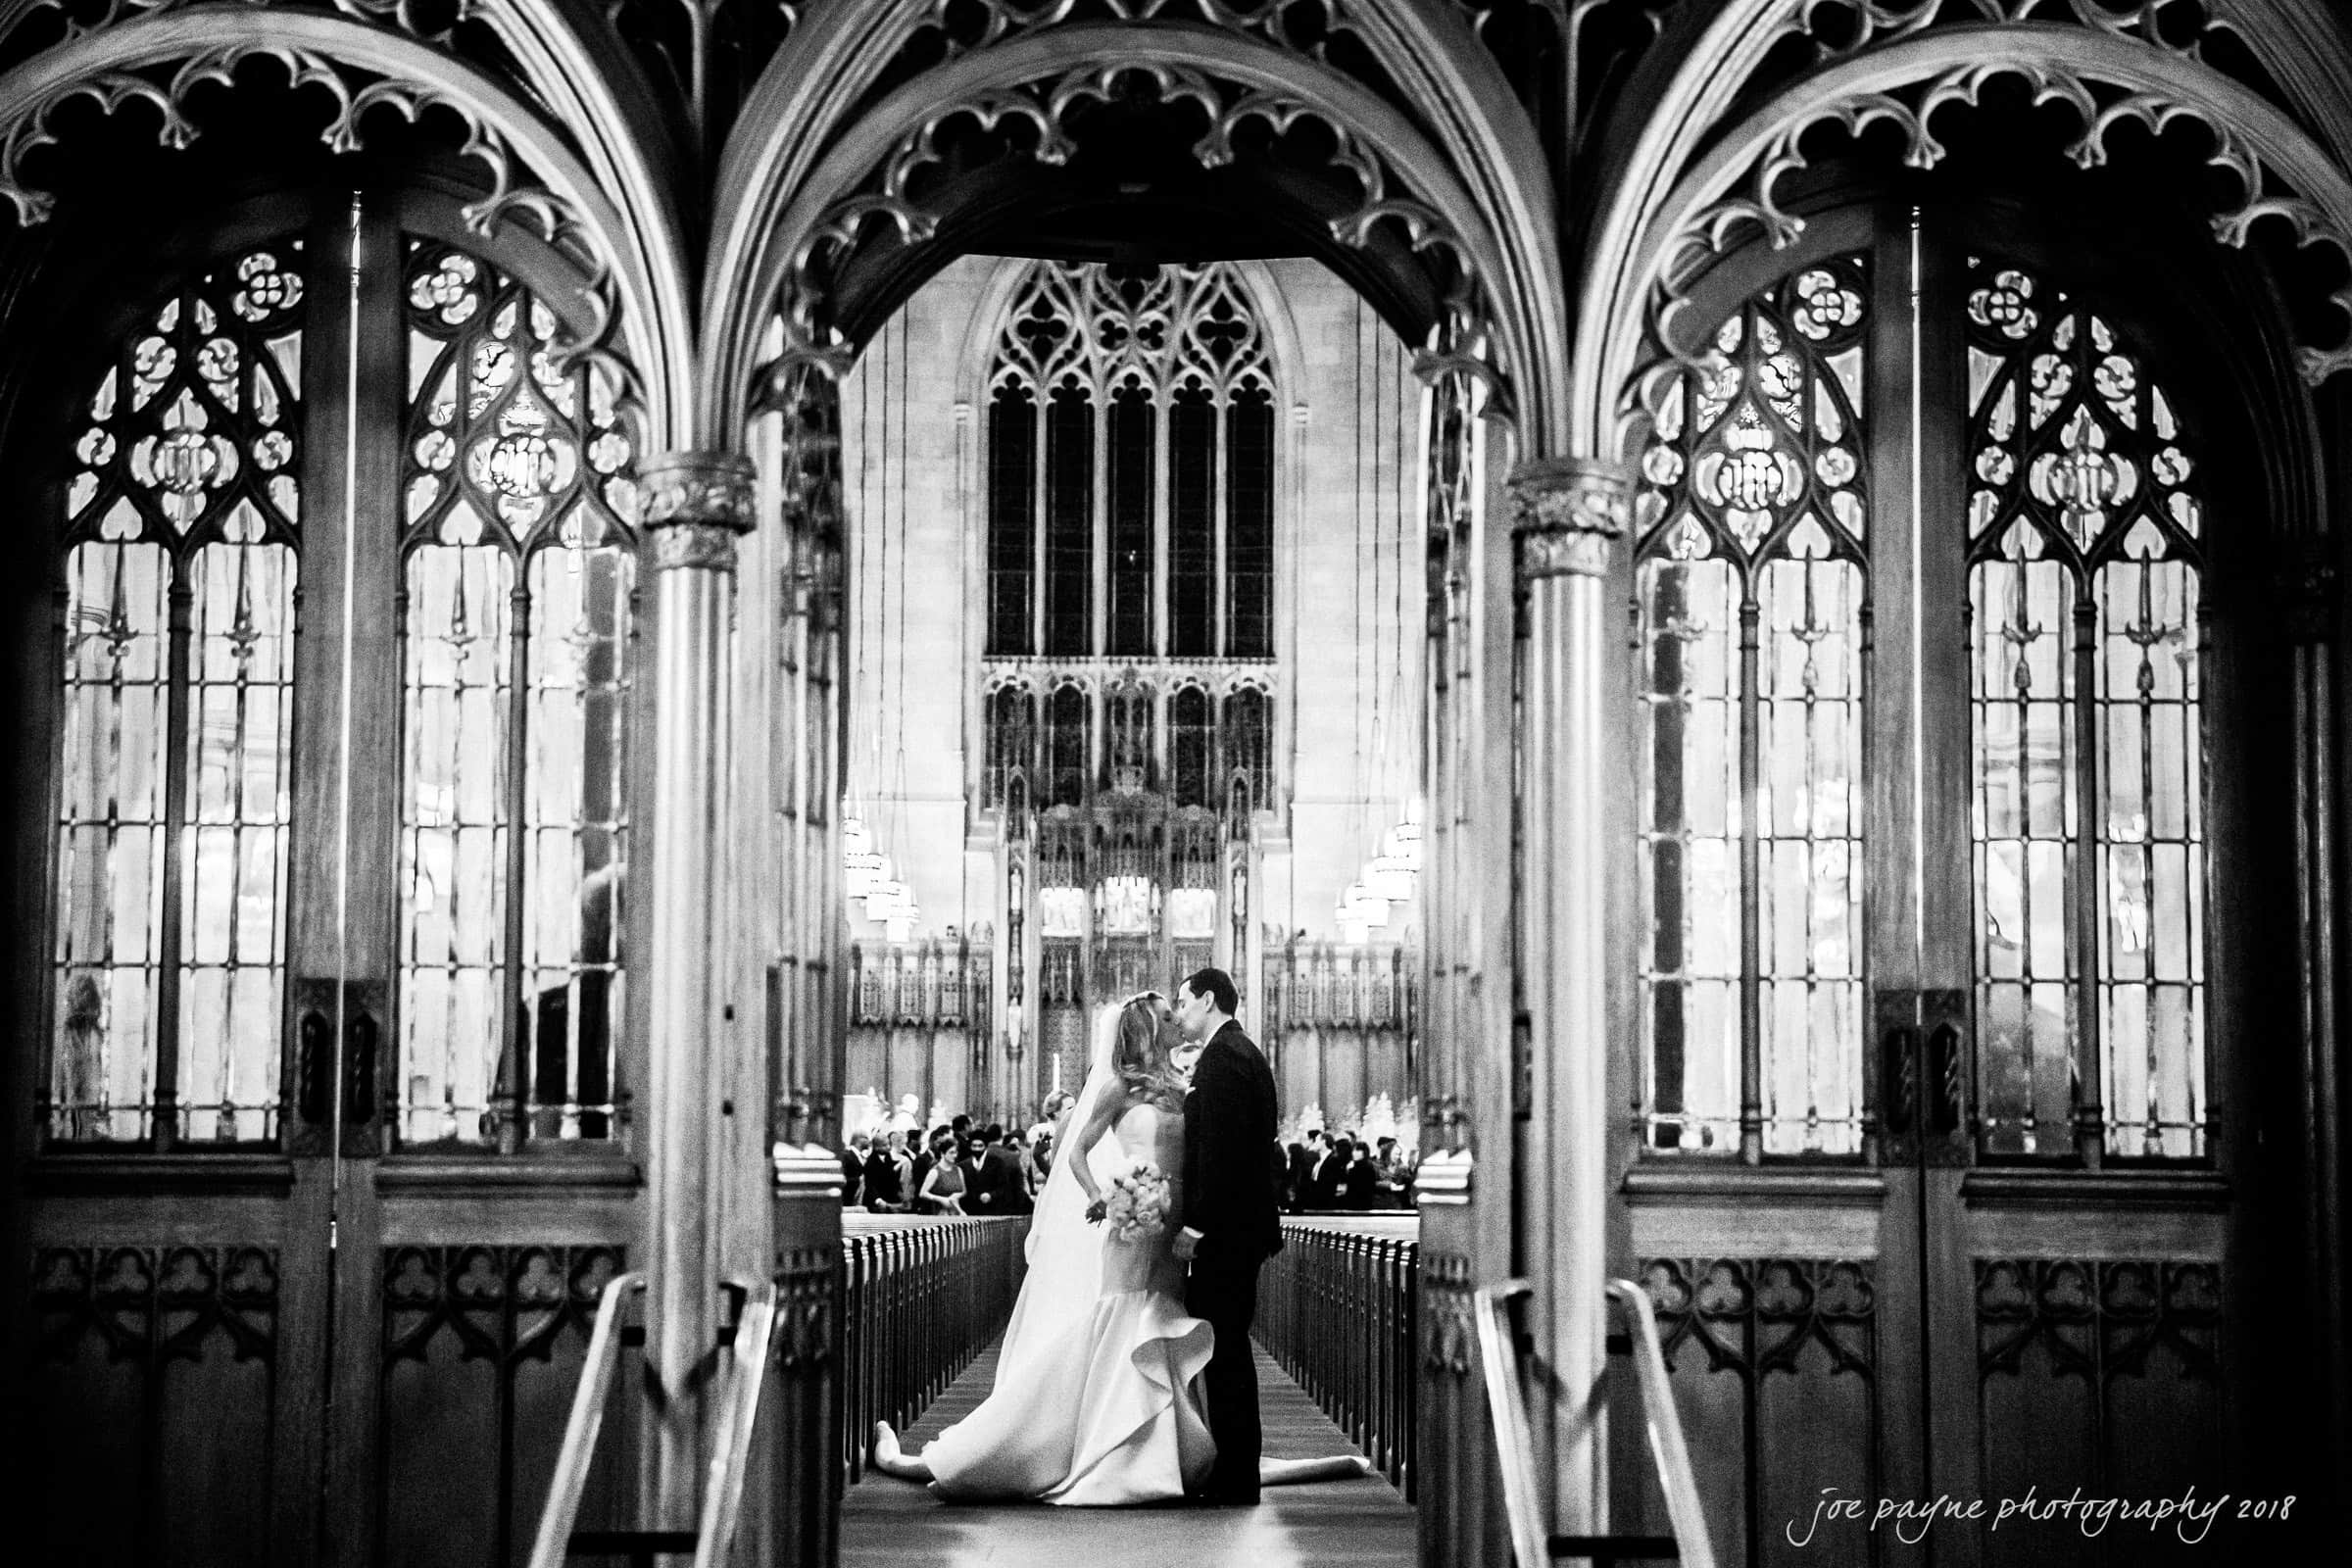 Duke Chapel Wedding Photo of Recessional Kiss Through Ornate Doors by Joe Payne in B&W